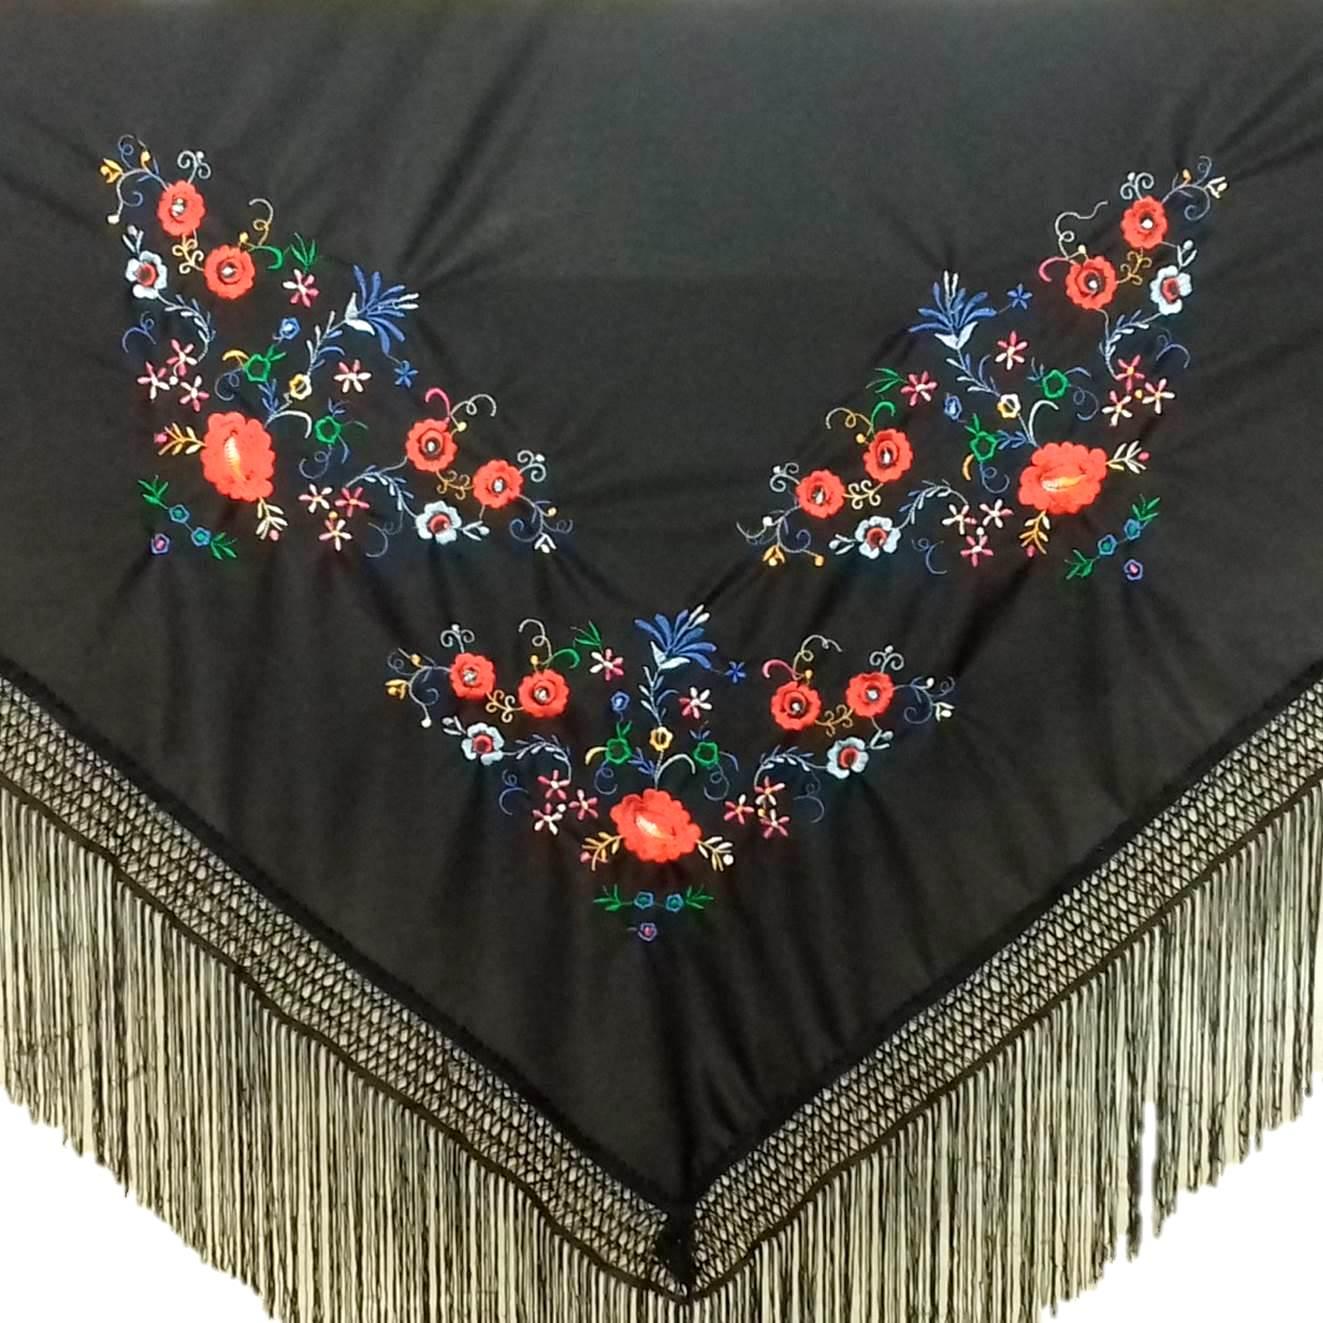 XALE ESPANHOL bordado 160x75 preto flamenco cigano